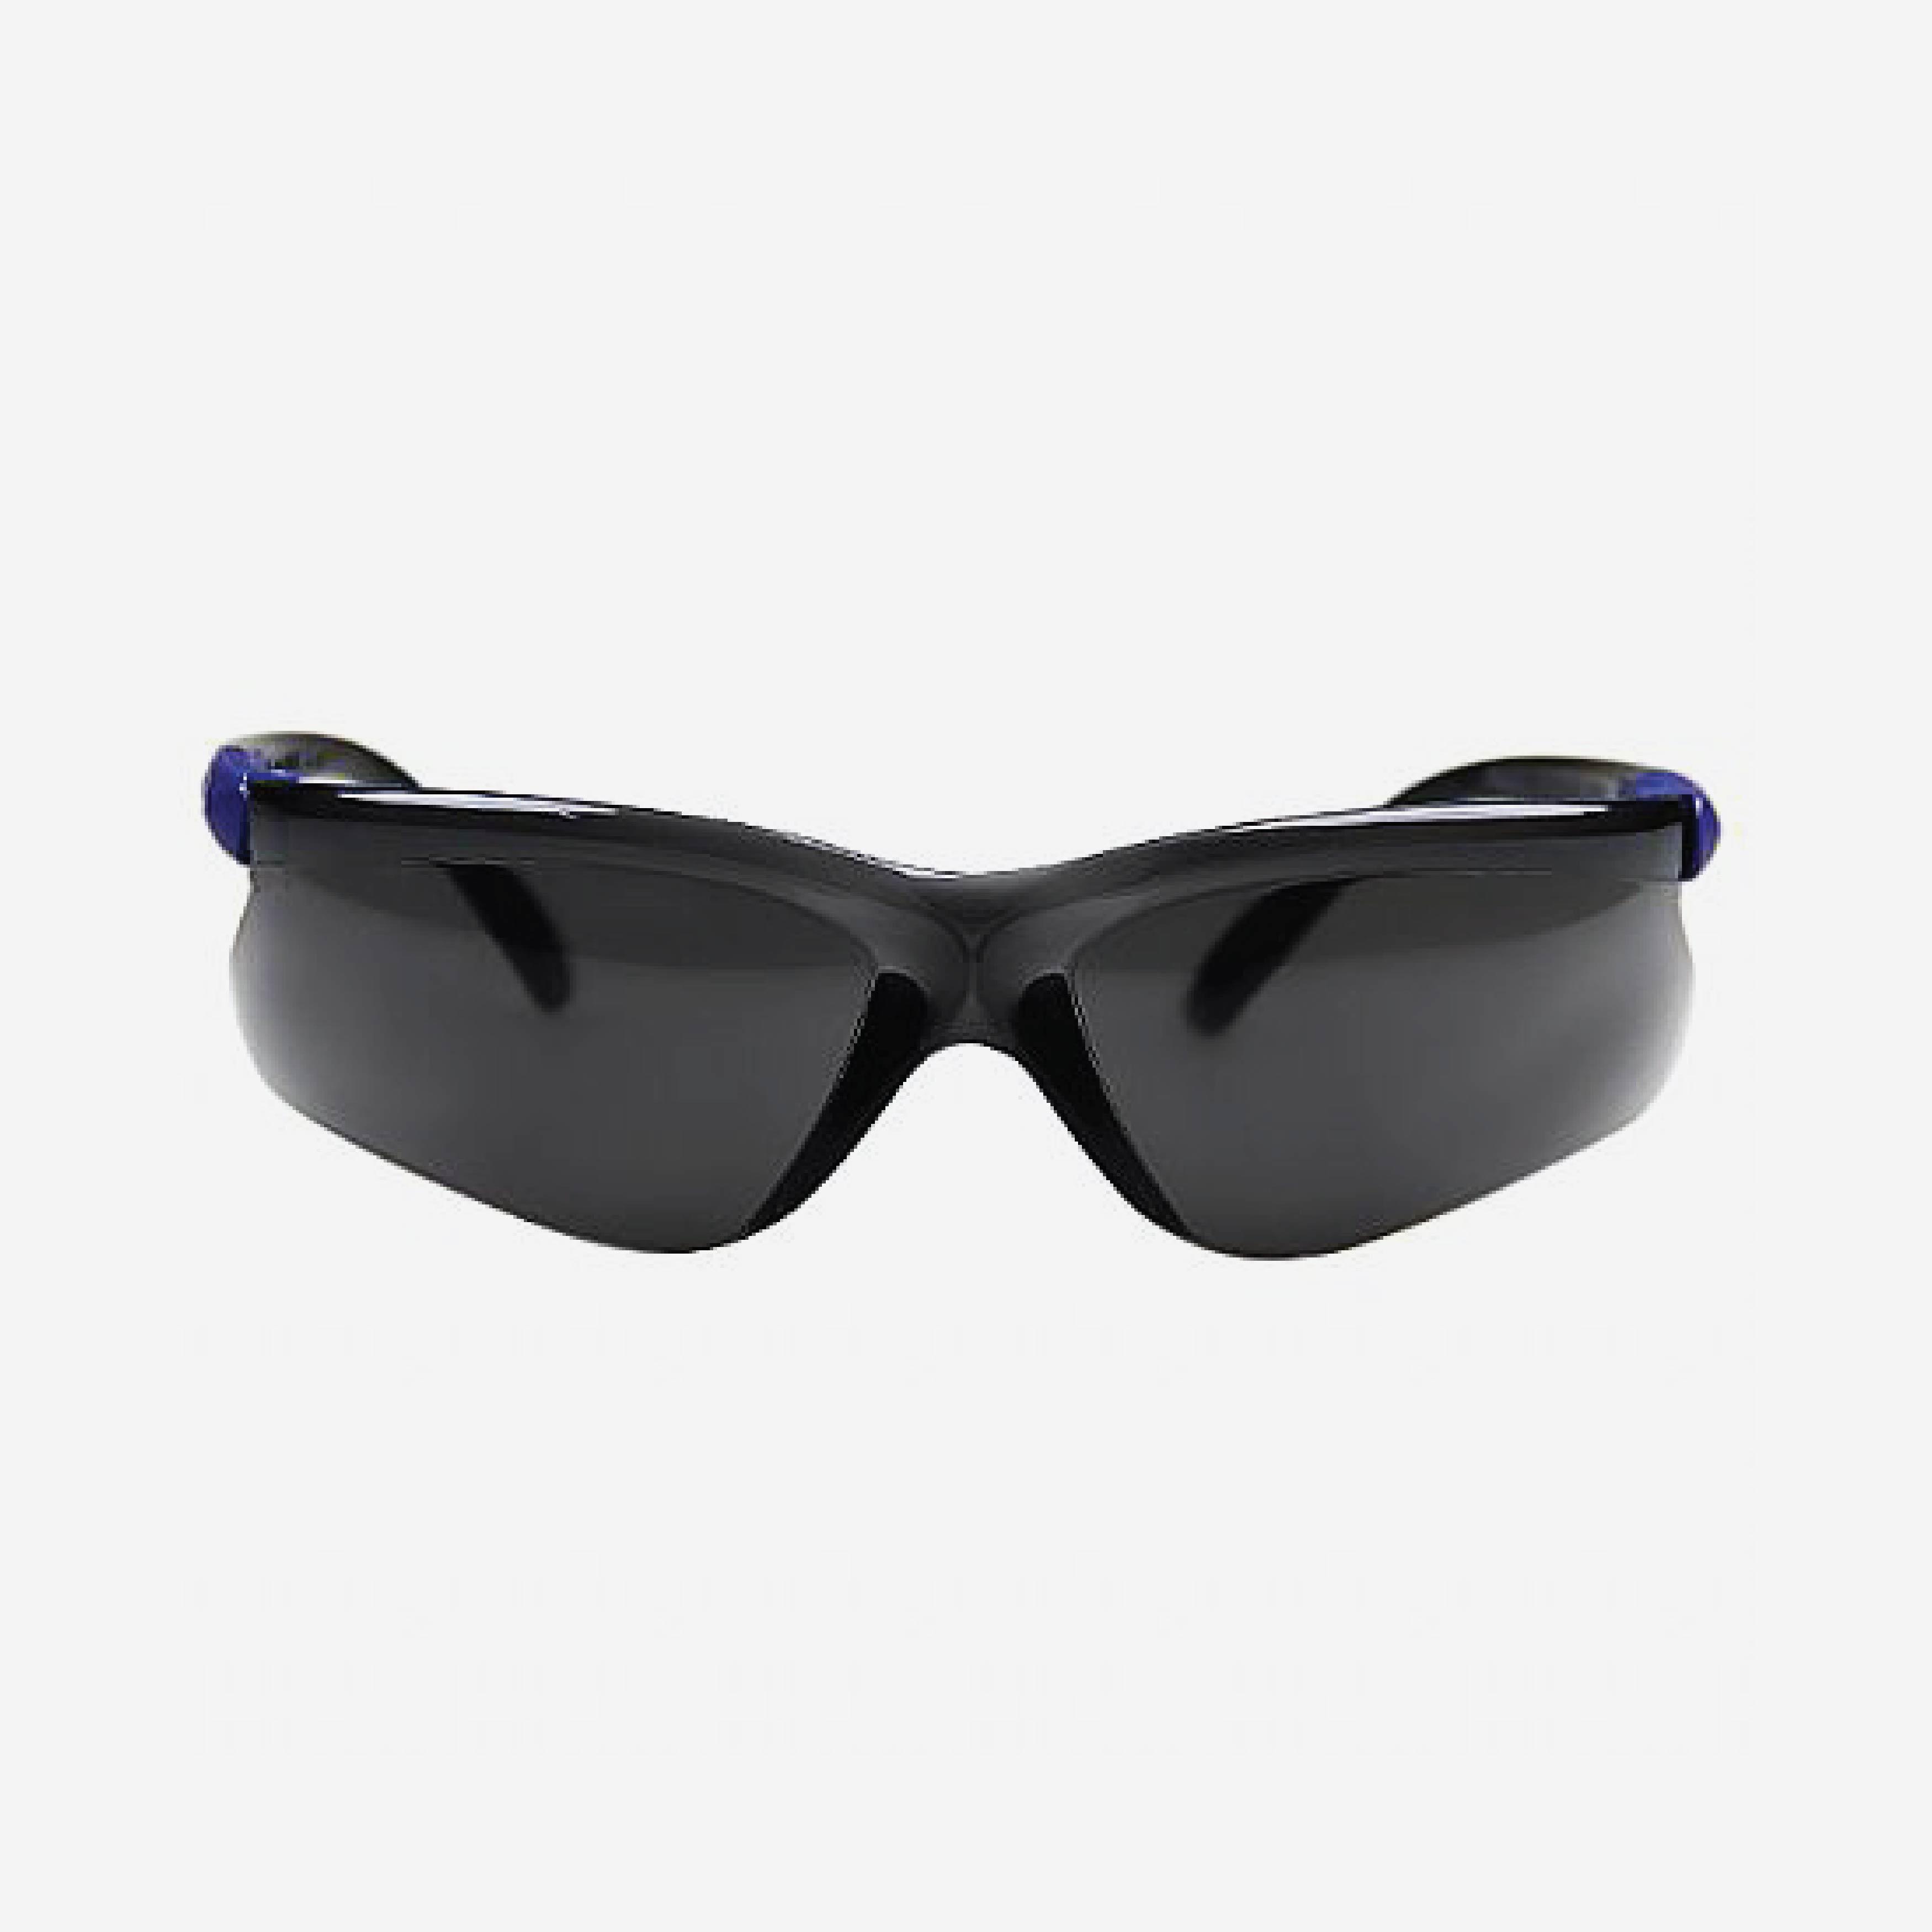 fe0e530f1f428 Óculos   NEMESIS Marrom Camuflado - Granville Equipamentos de ...